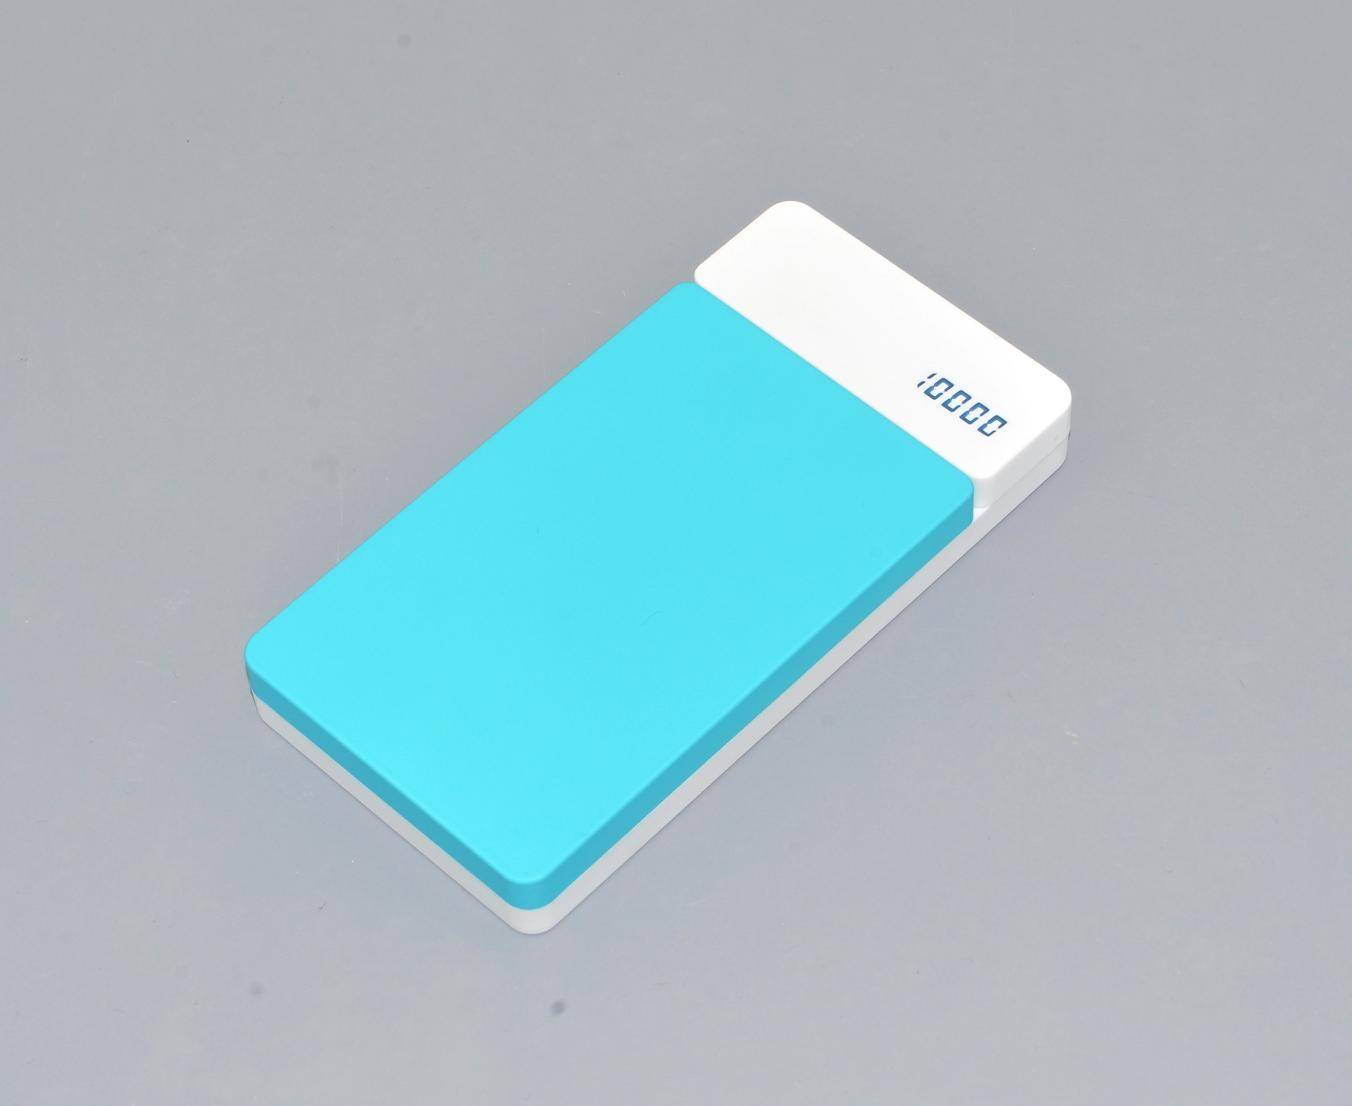 EP-U1001 high capacity 10,000mAh power bank for iphone, ipad